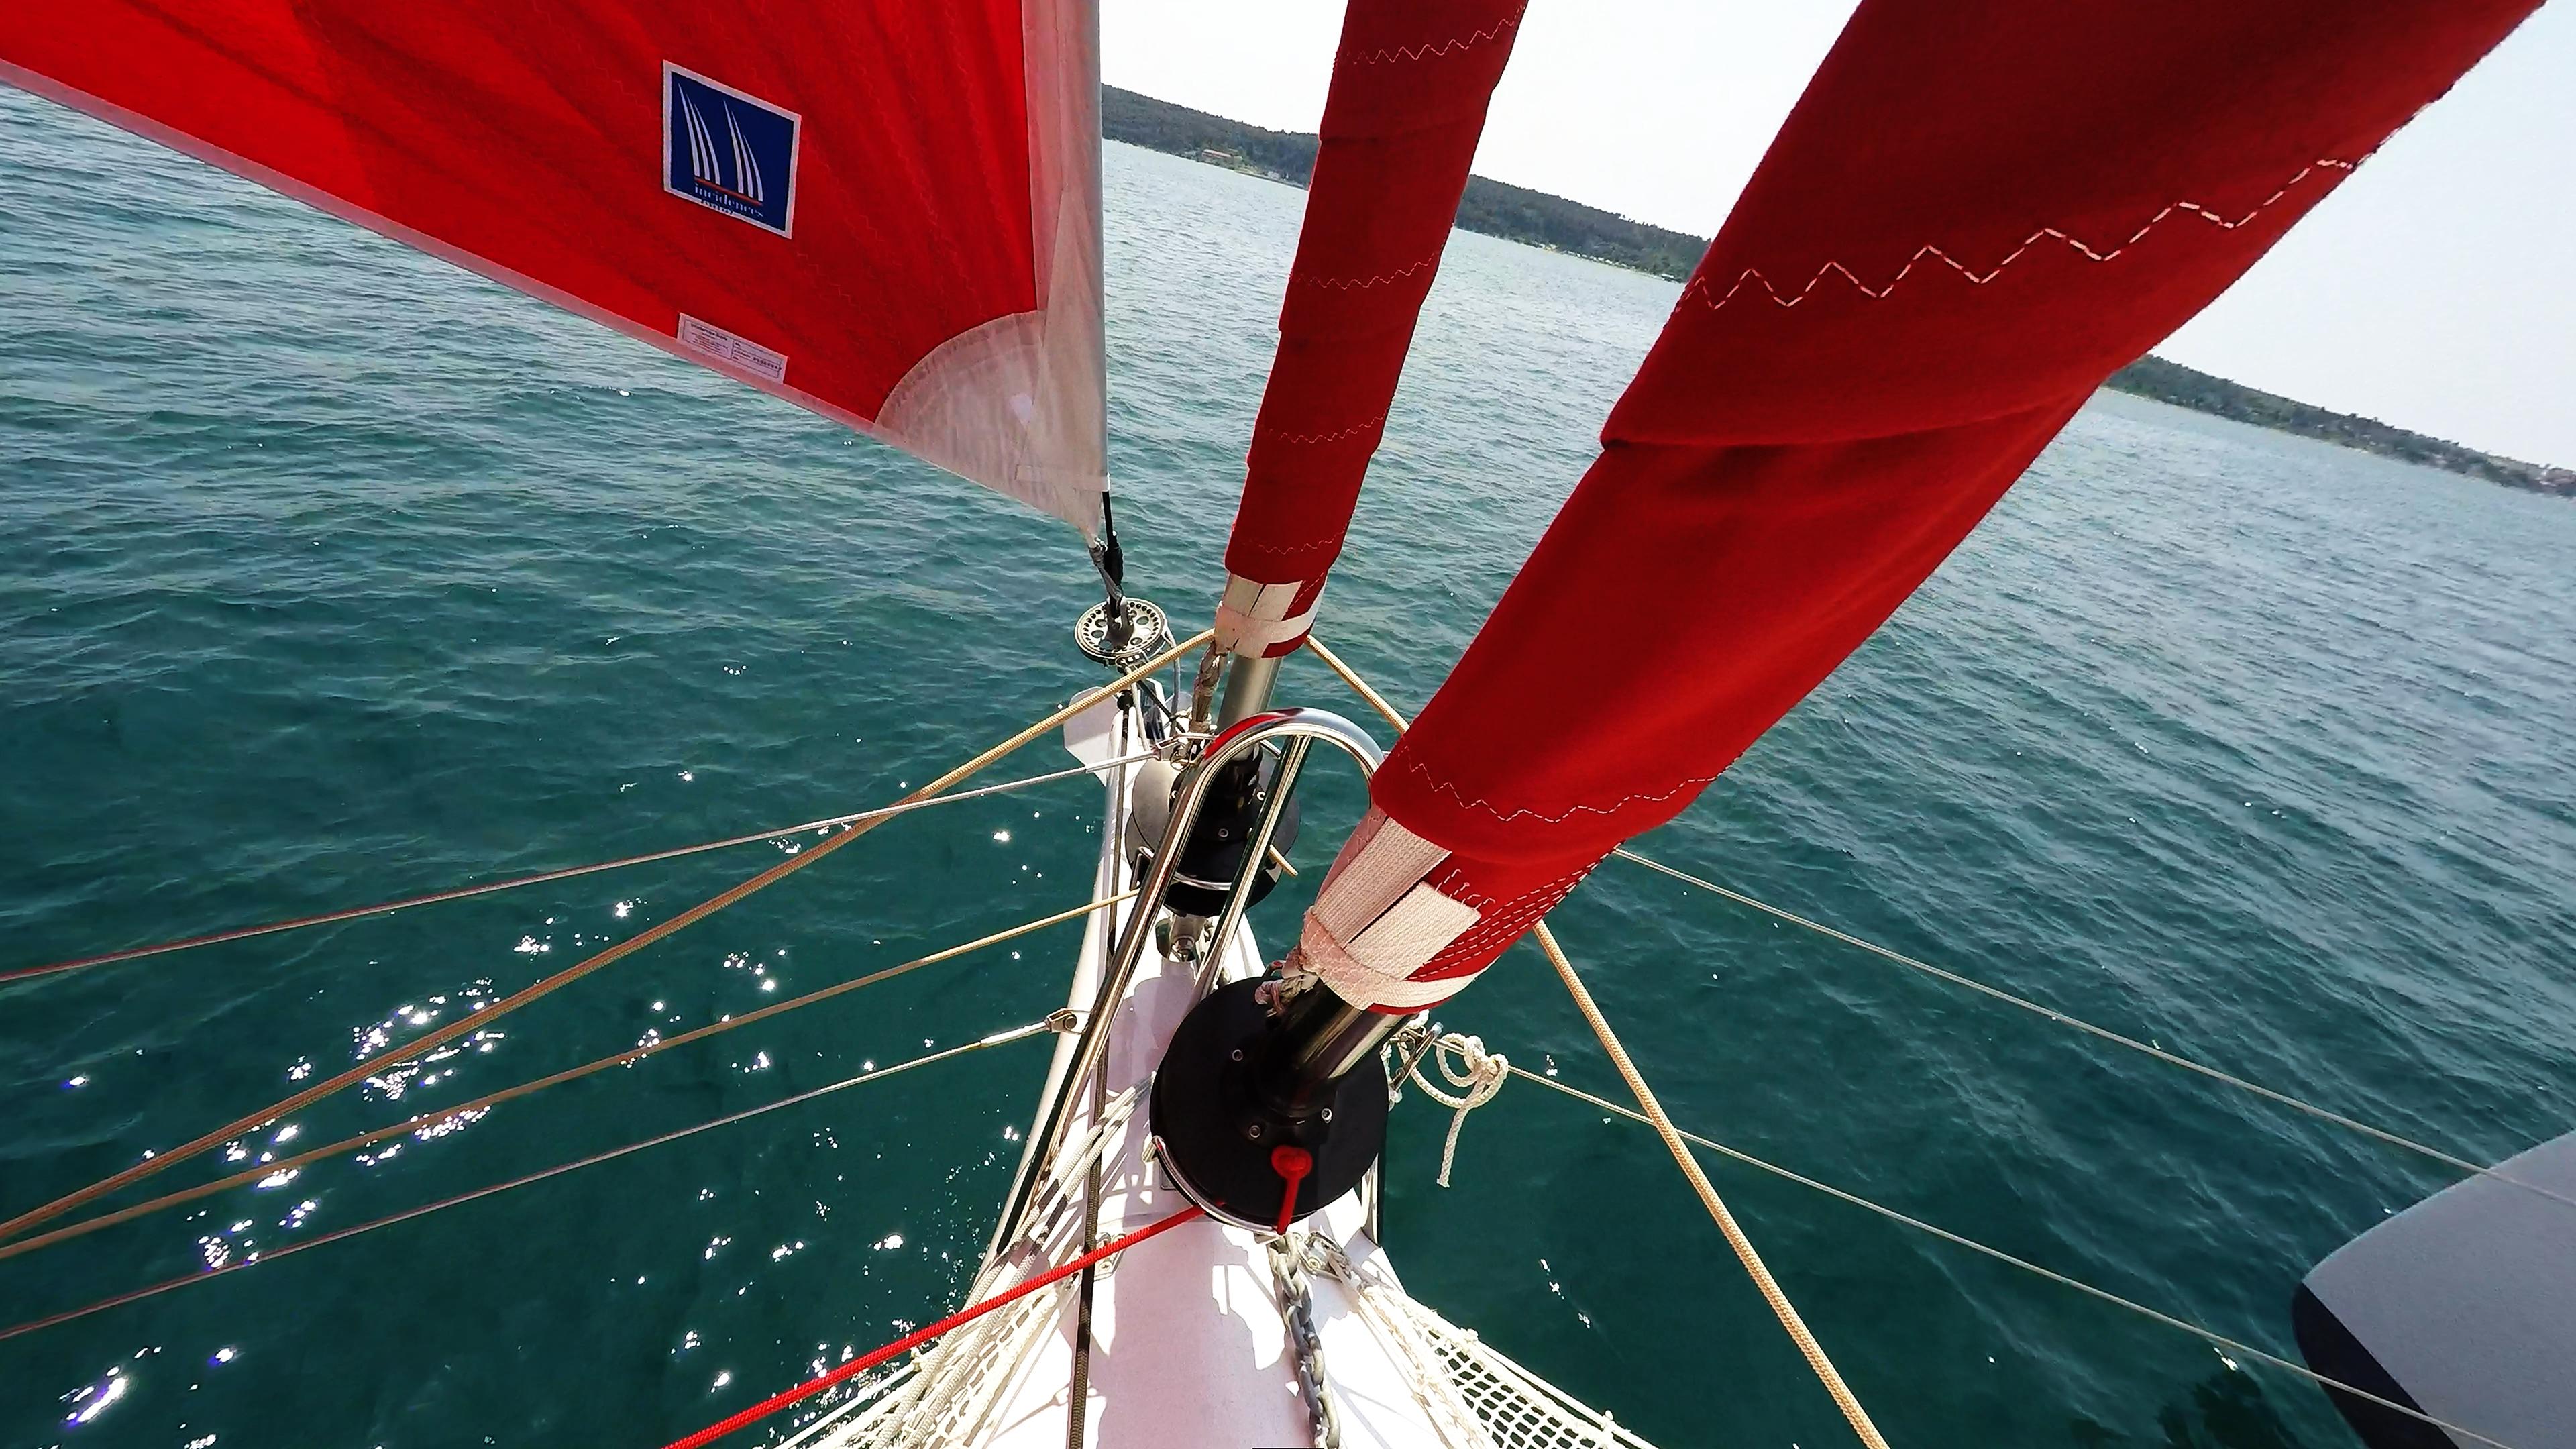 multiscafo yacht prua roll genoa vela gennaker